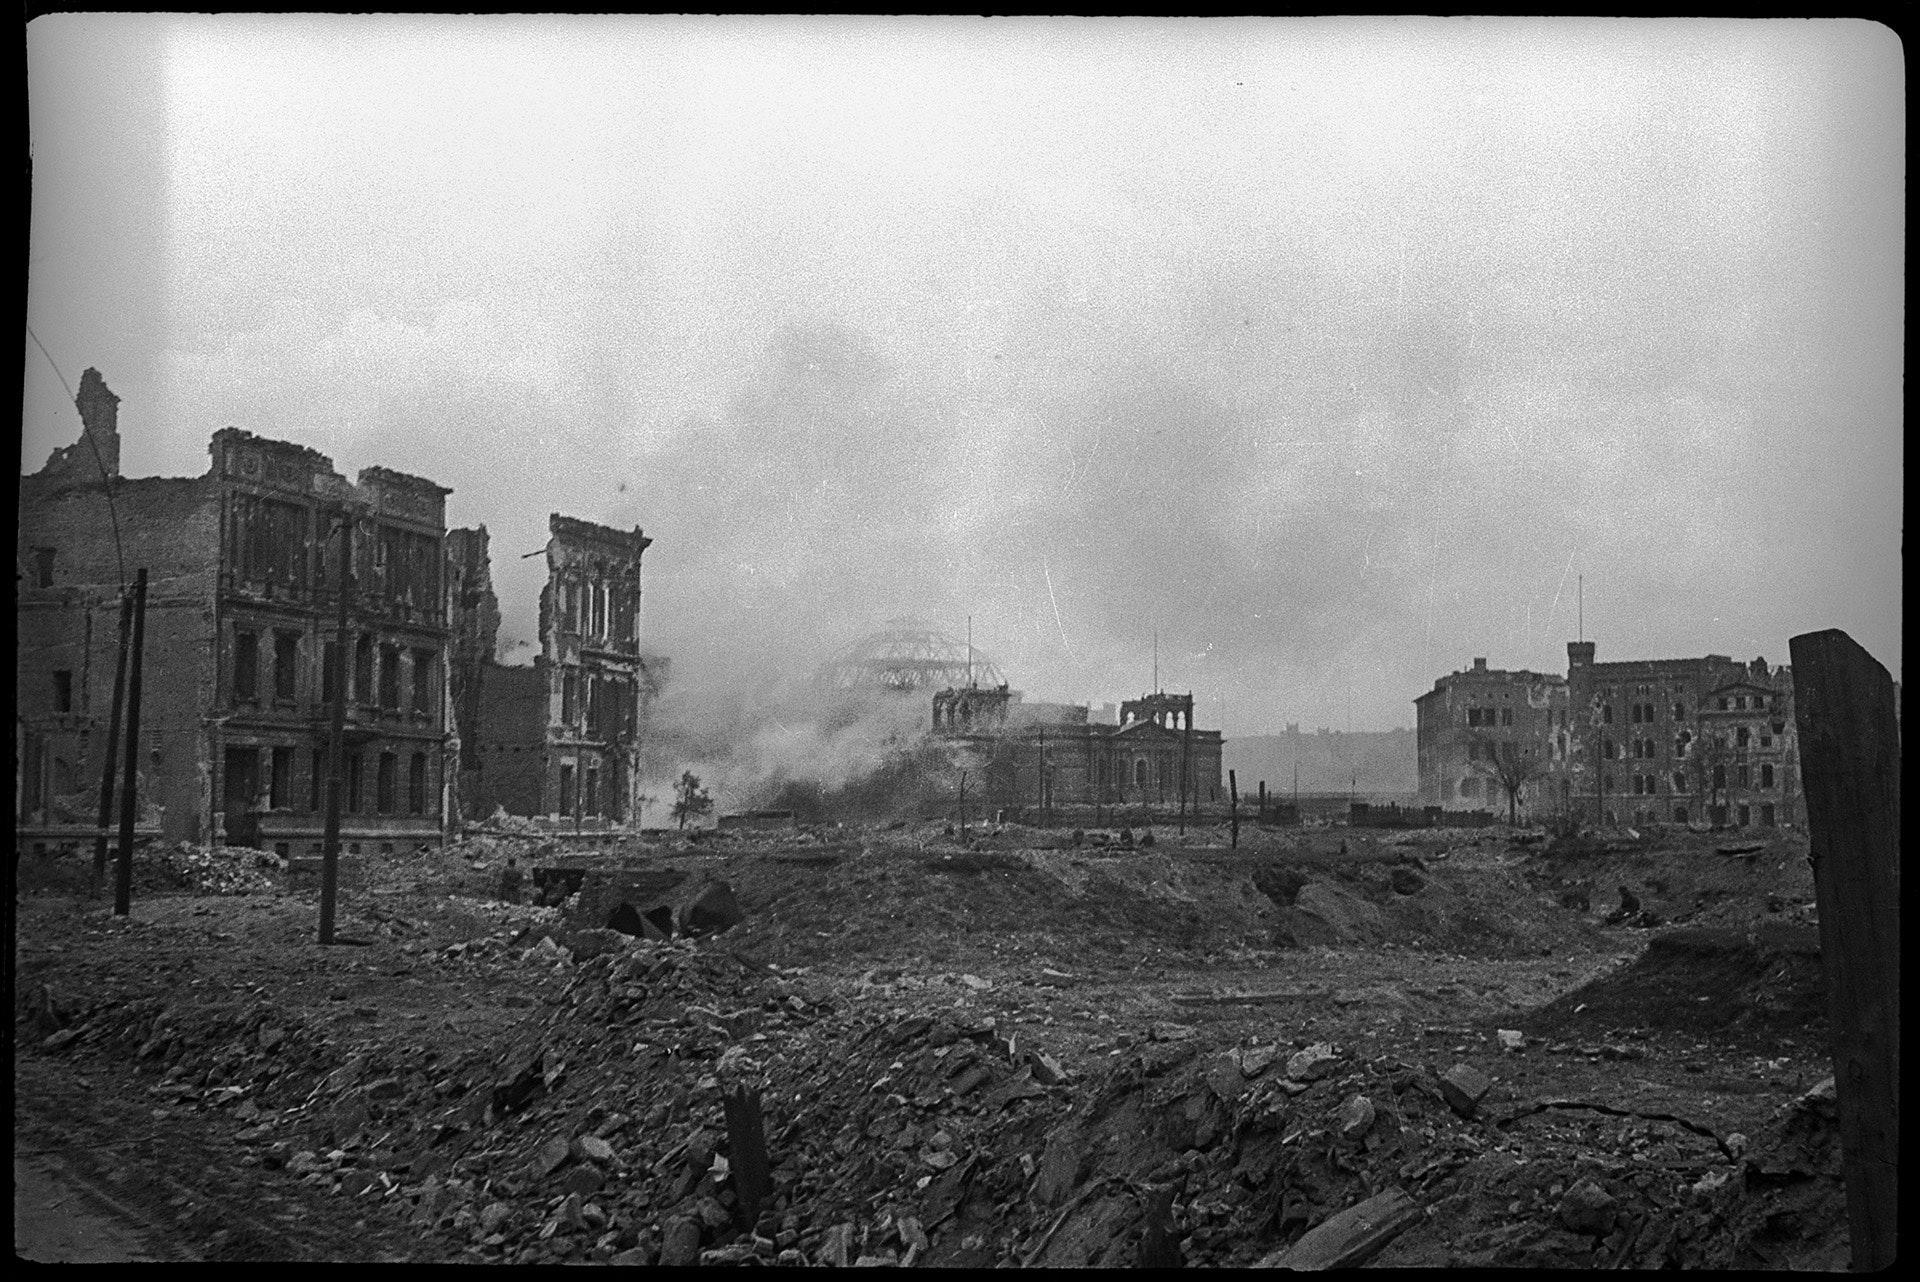 Германия, Берлин, 1945Рейхстаг